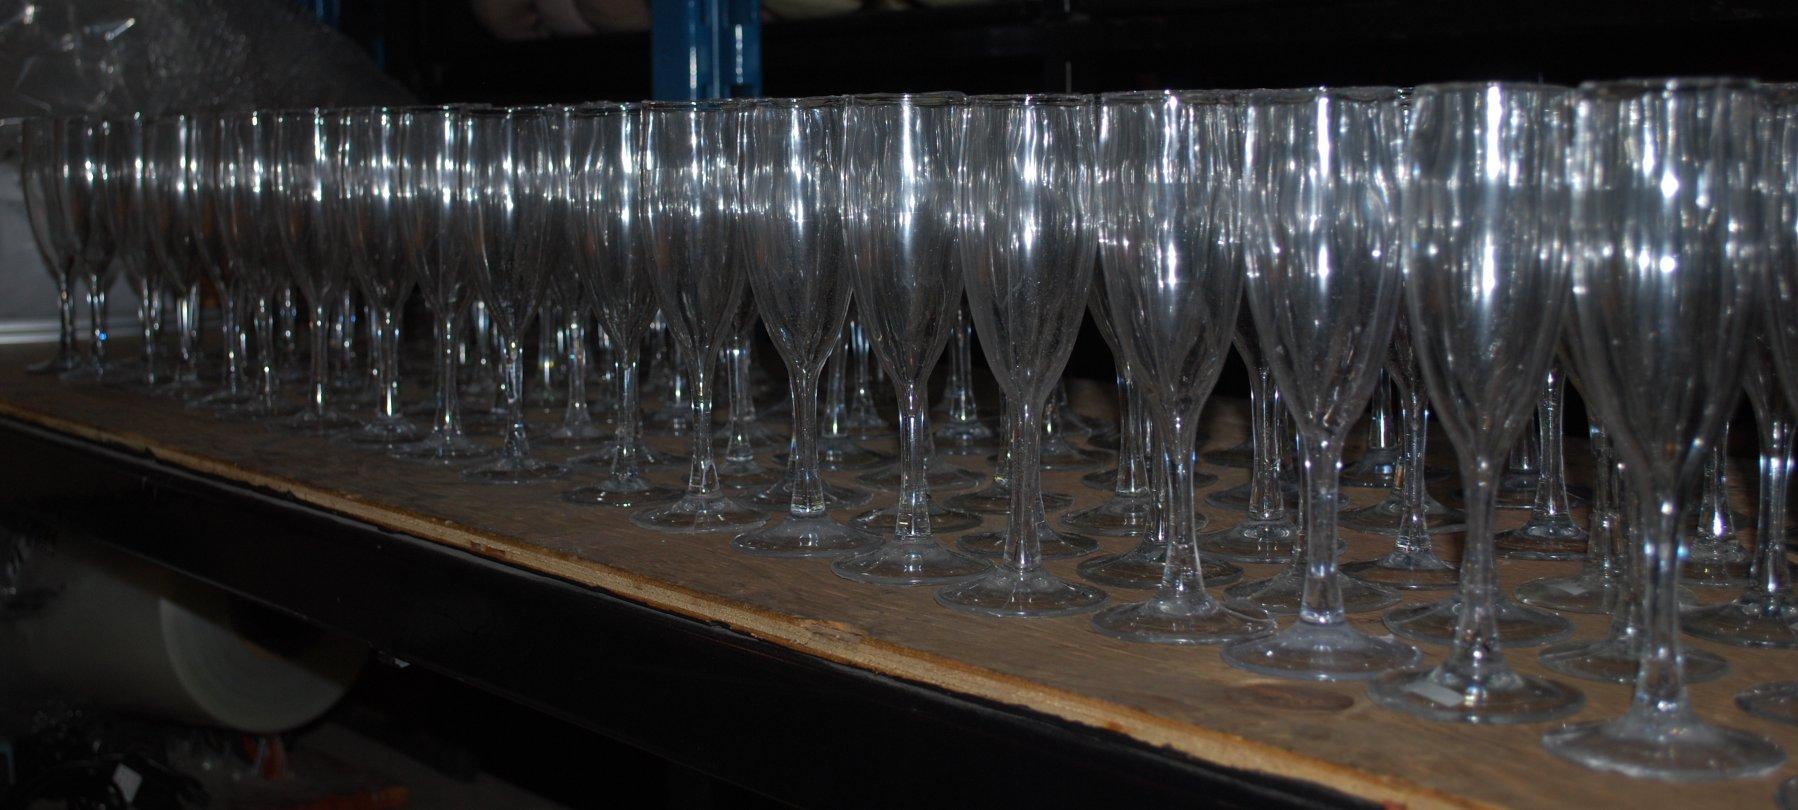 Buy Breakaway Glass @ Thomas FX